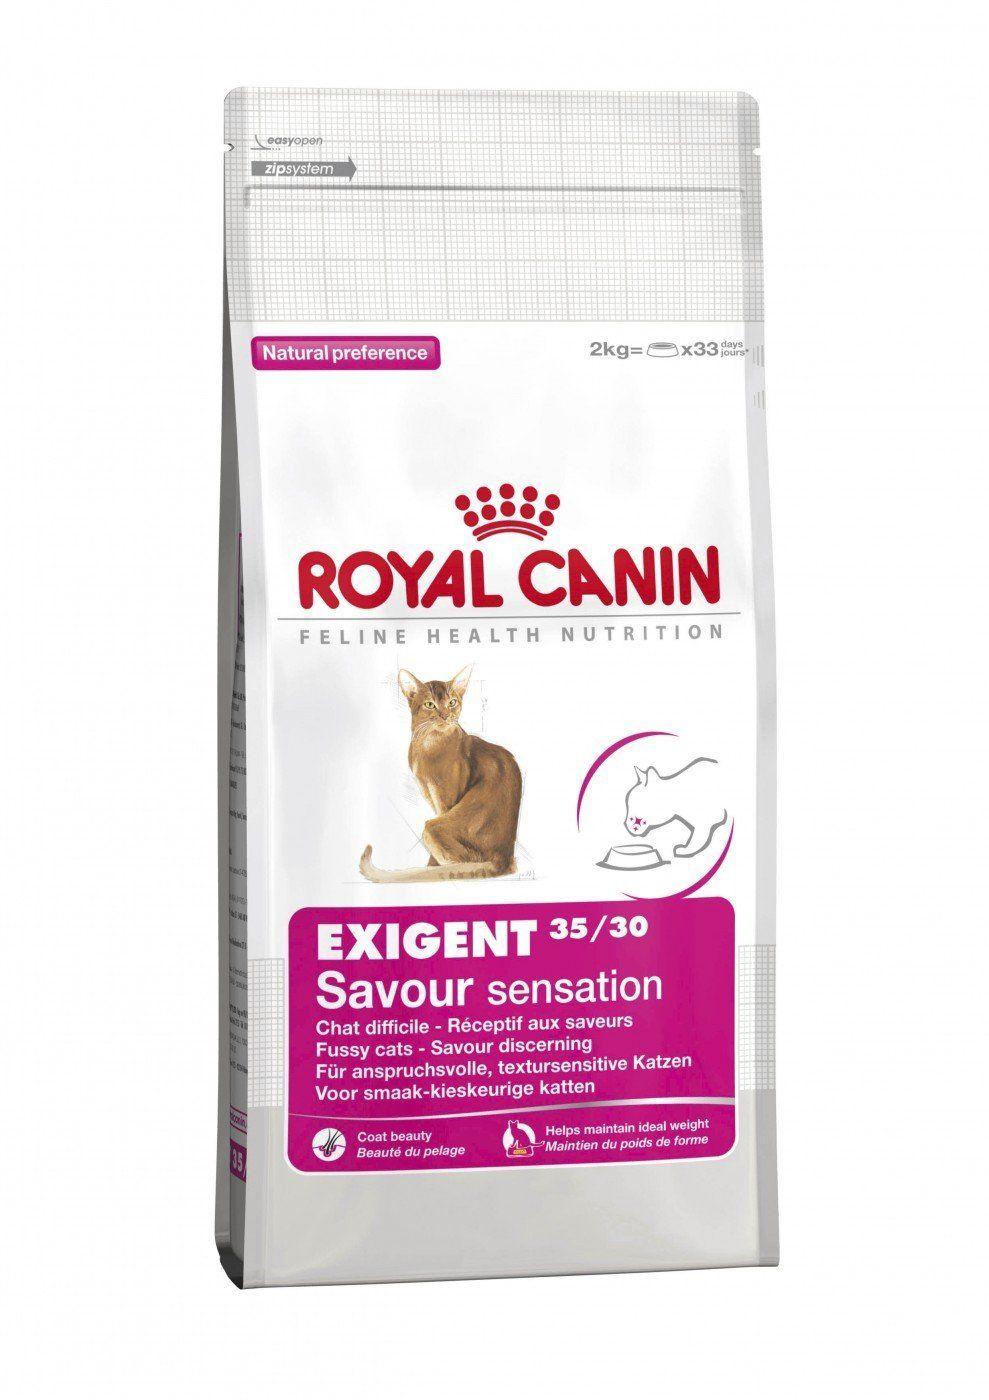 Royal Canin Exigent Savour Sensation 35 30 4kgs Read More At The Image Link Catfood Royal Canin Savor Sensation